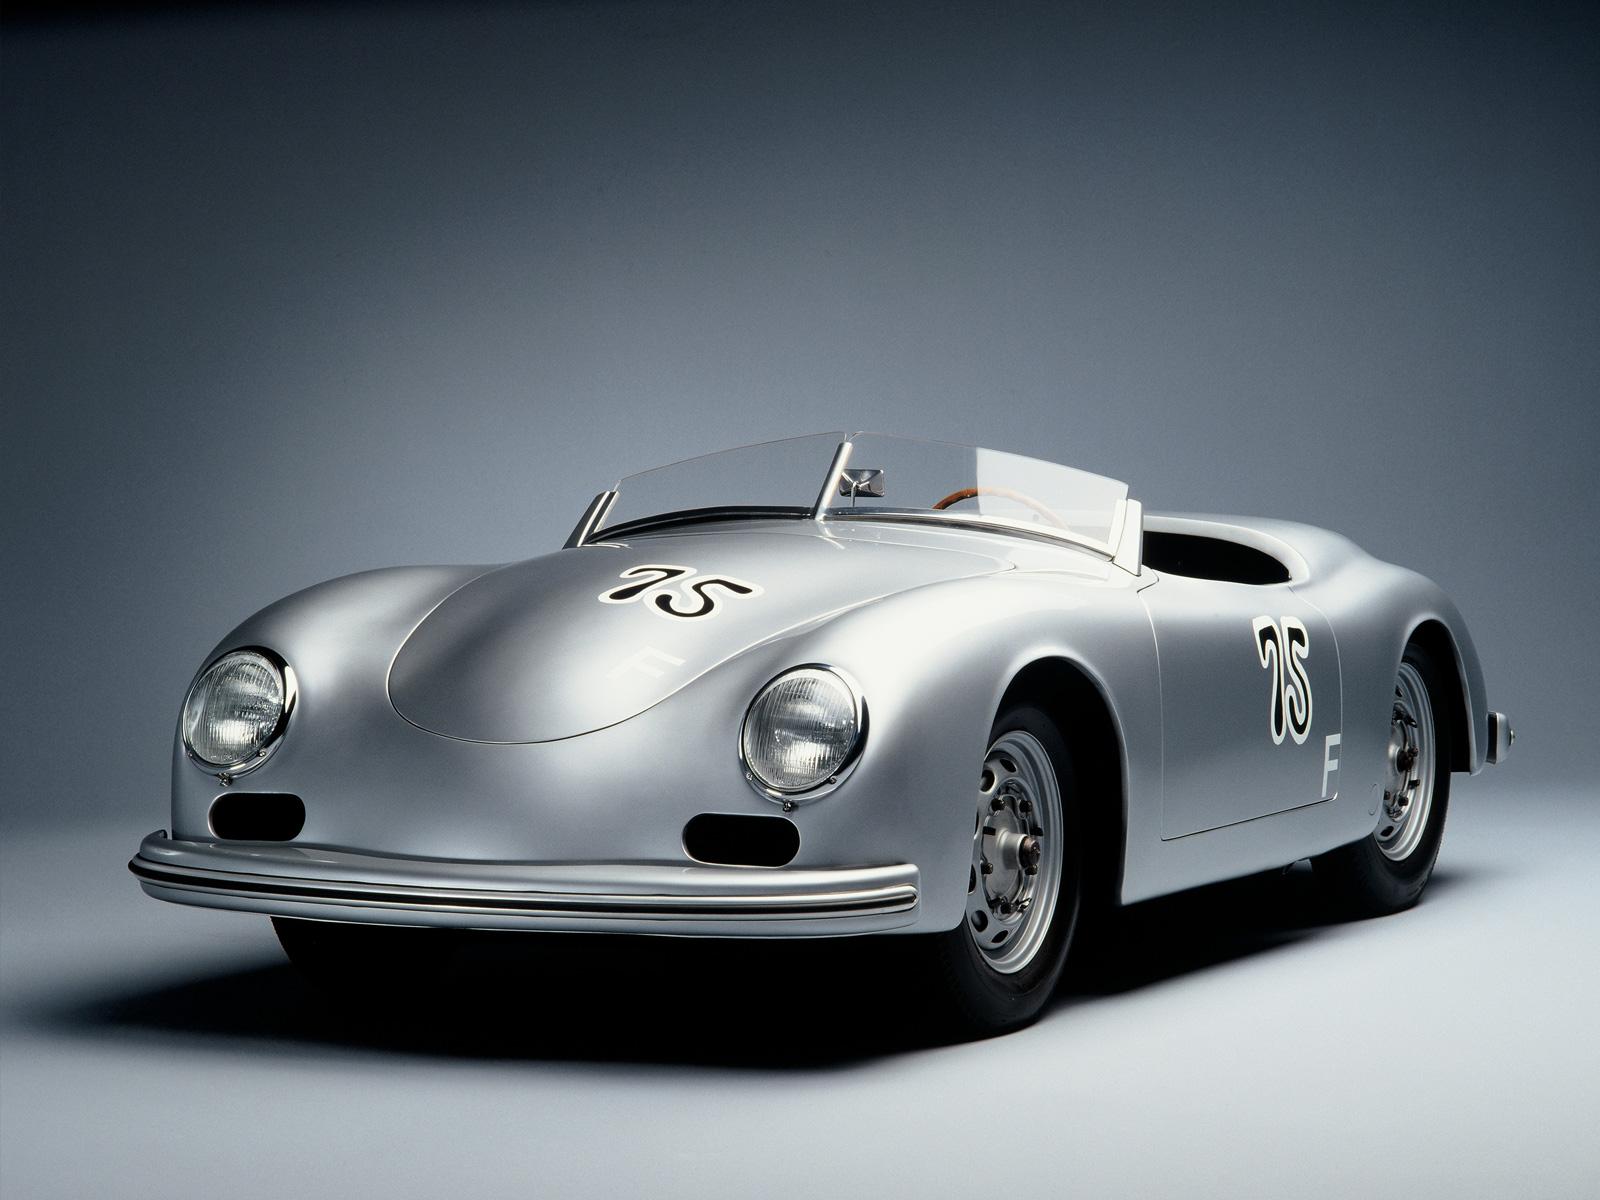 50 Classic Porsche Wallpaper On Wallpapersafari